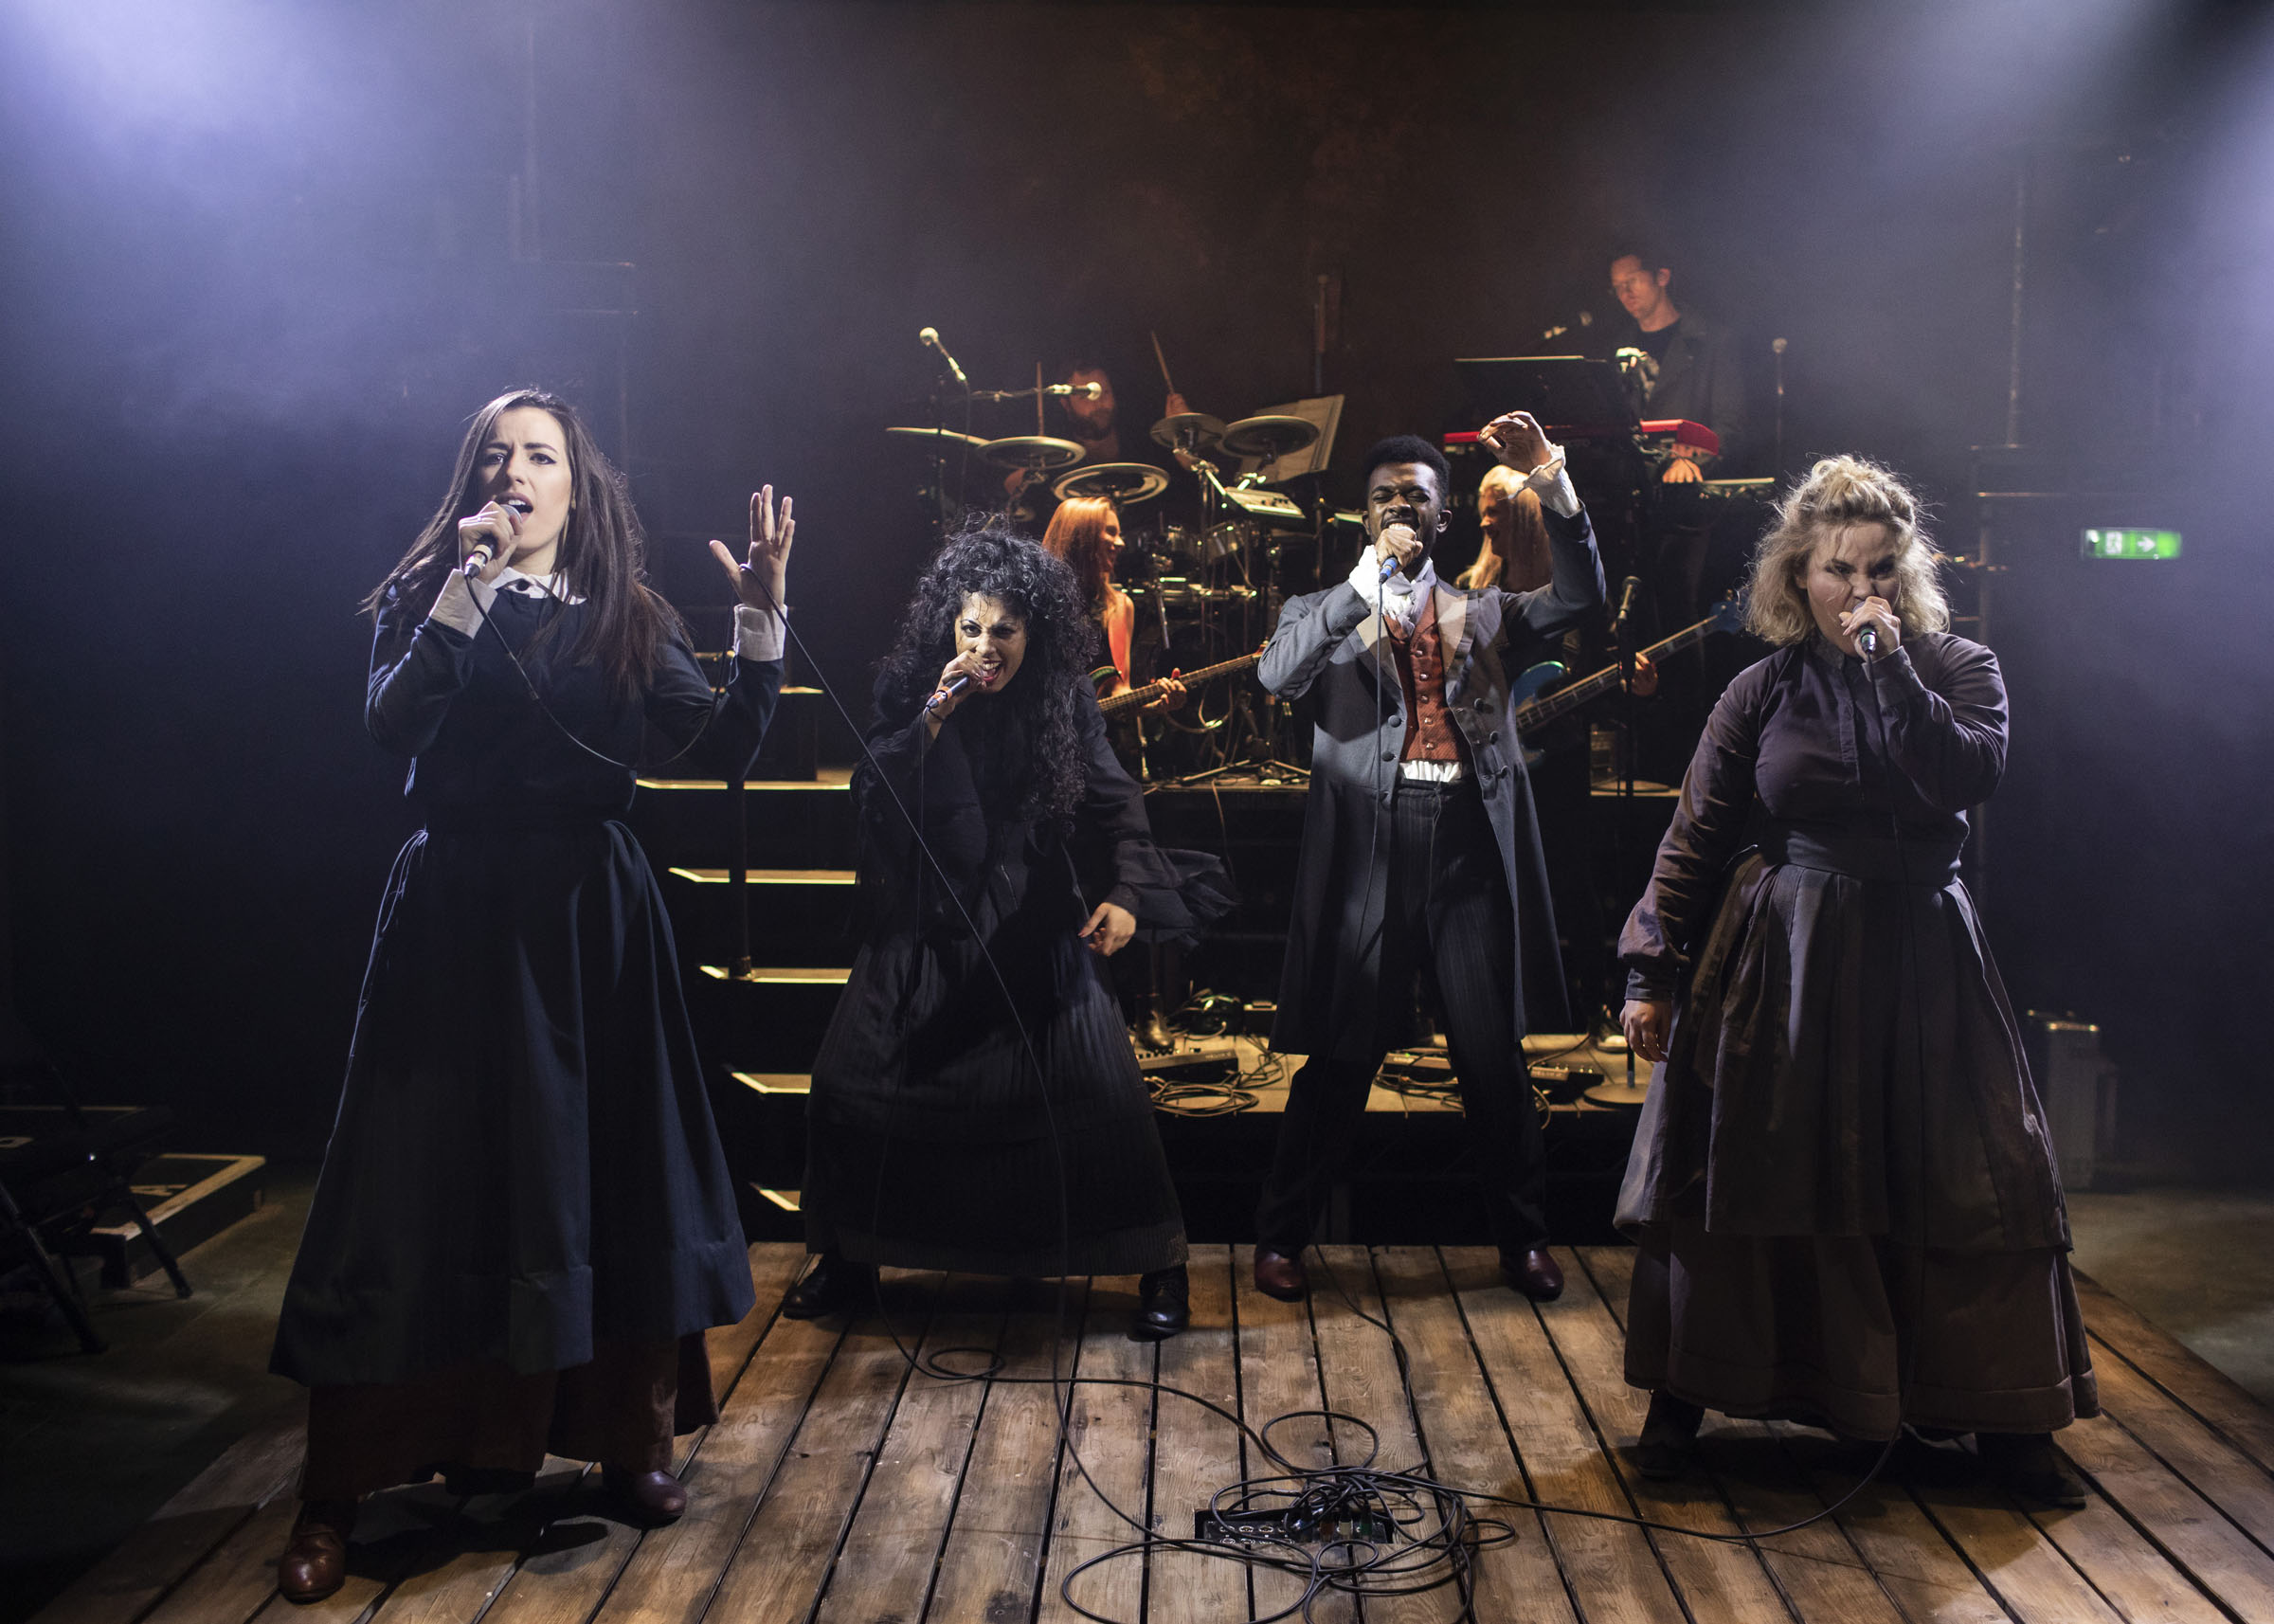 Molly Lynch (Anne Brontë); Siobhan Athwal (Emily Brontë); Matthew Jacobs Morgan (Branwell Brontë); Natasha J. Barnes (Charlotte Brontë)